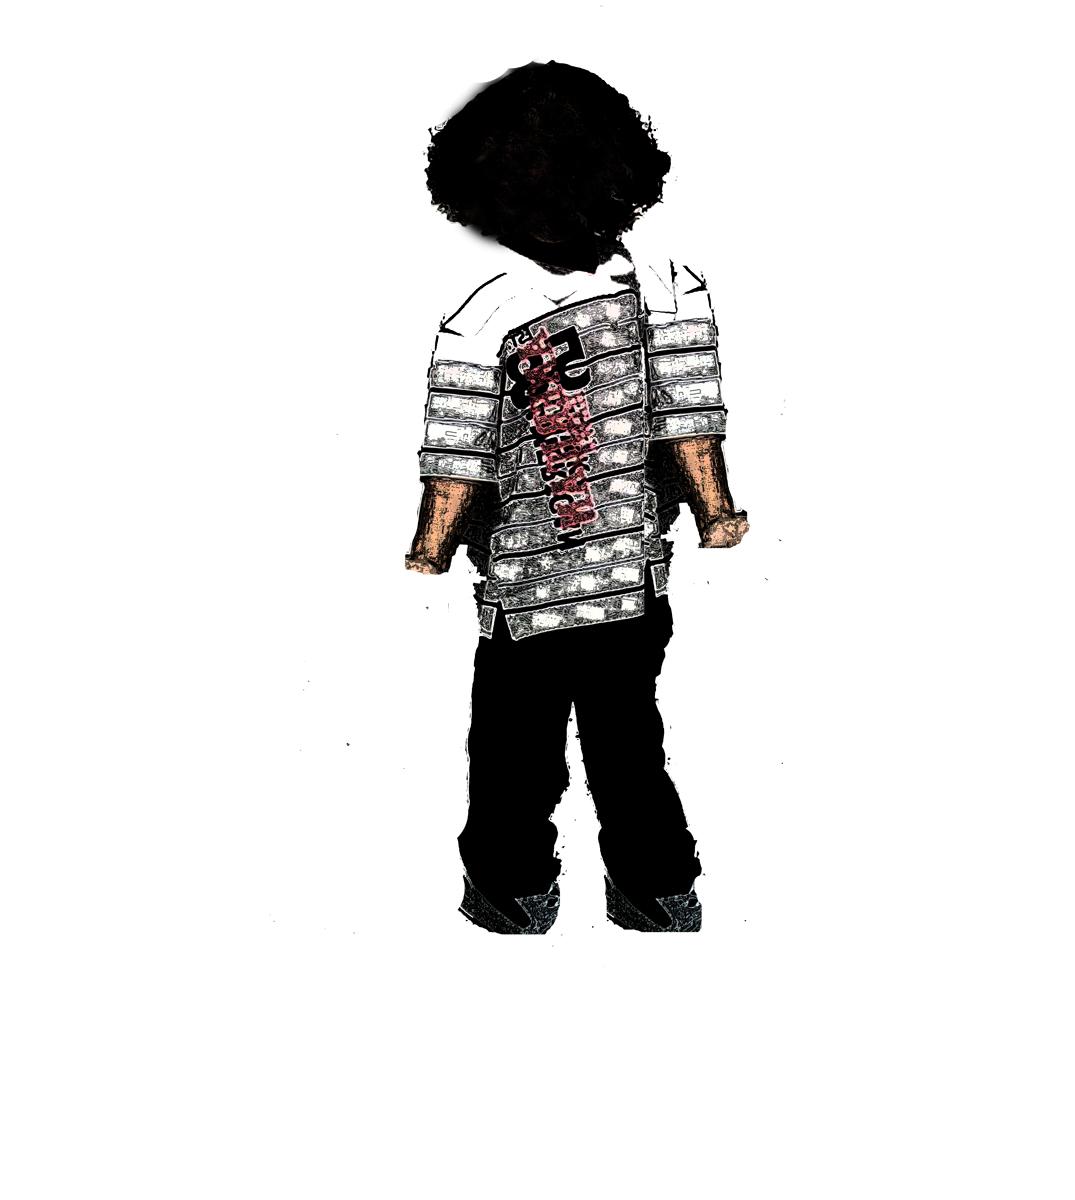 Shirt design needed - T Shirt Design By David Winwood For Urban Skater T Shirt Design Needed